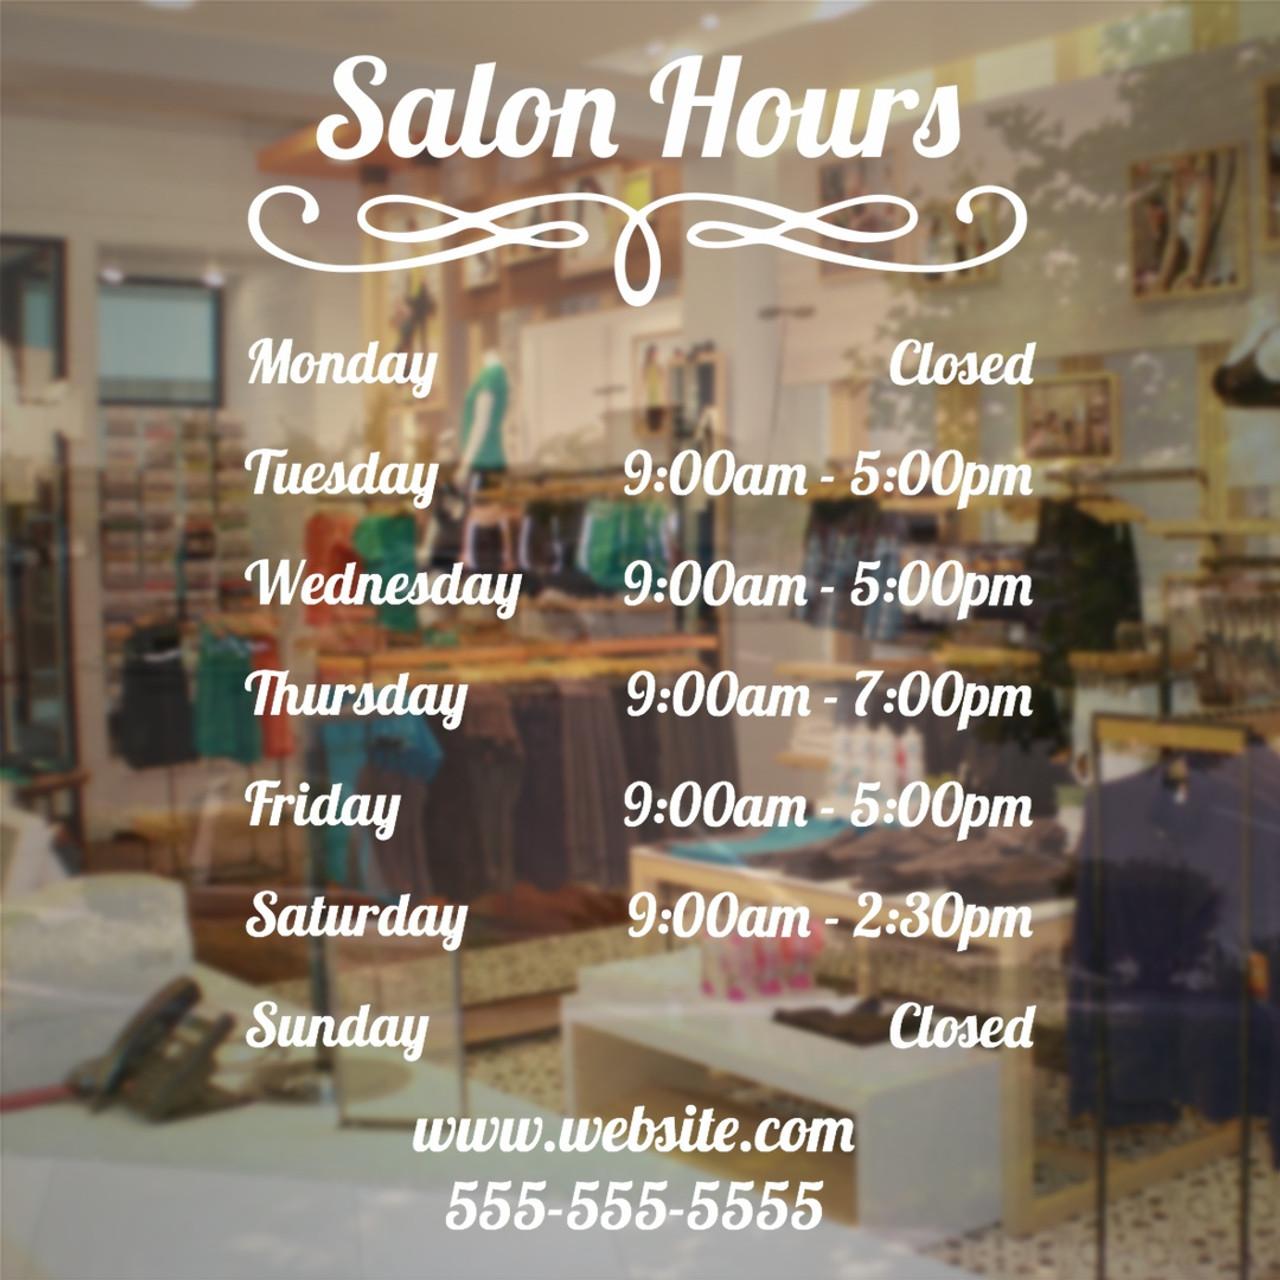 Salon hours window decal